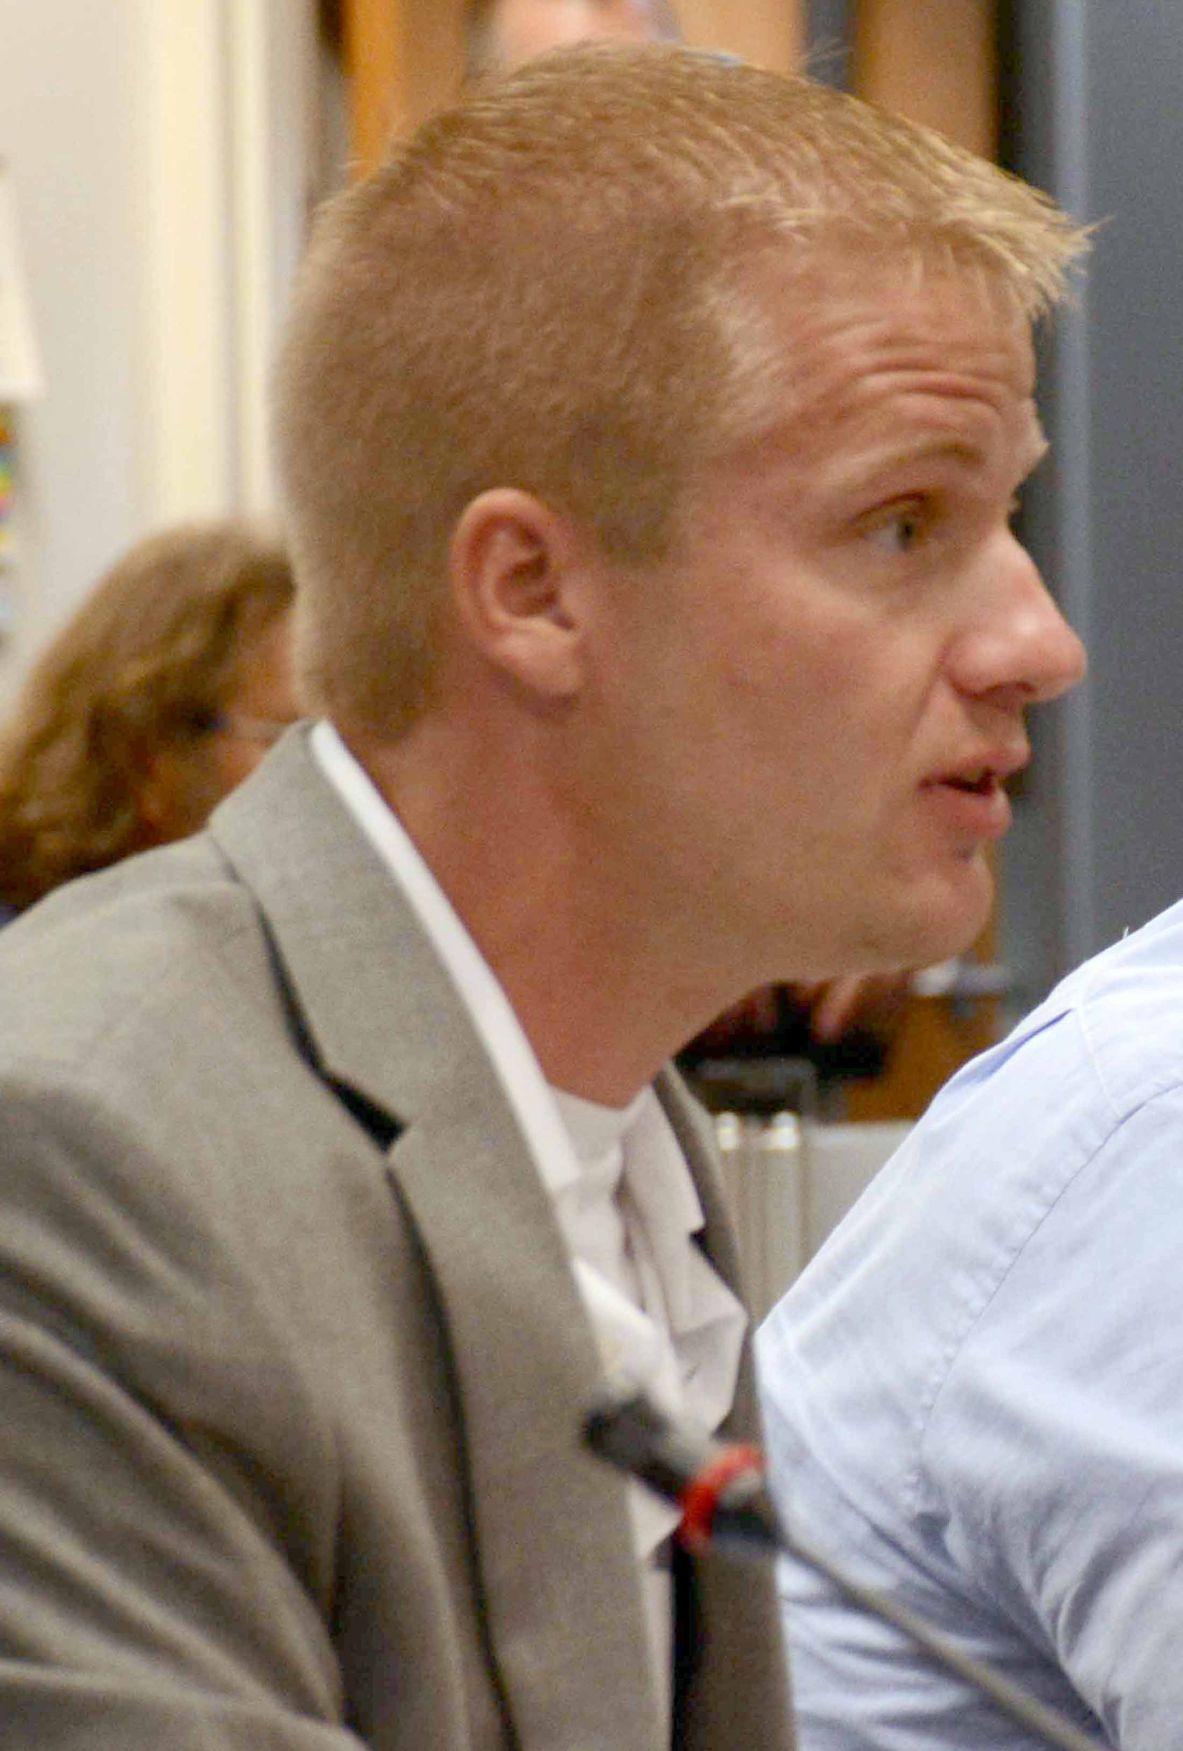 Sauk County Board approves referendum on money in politics